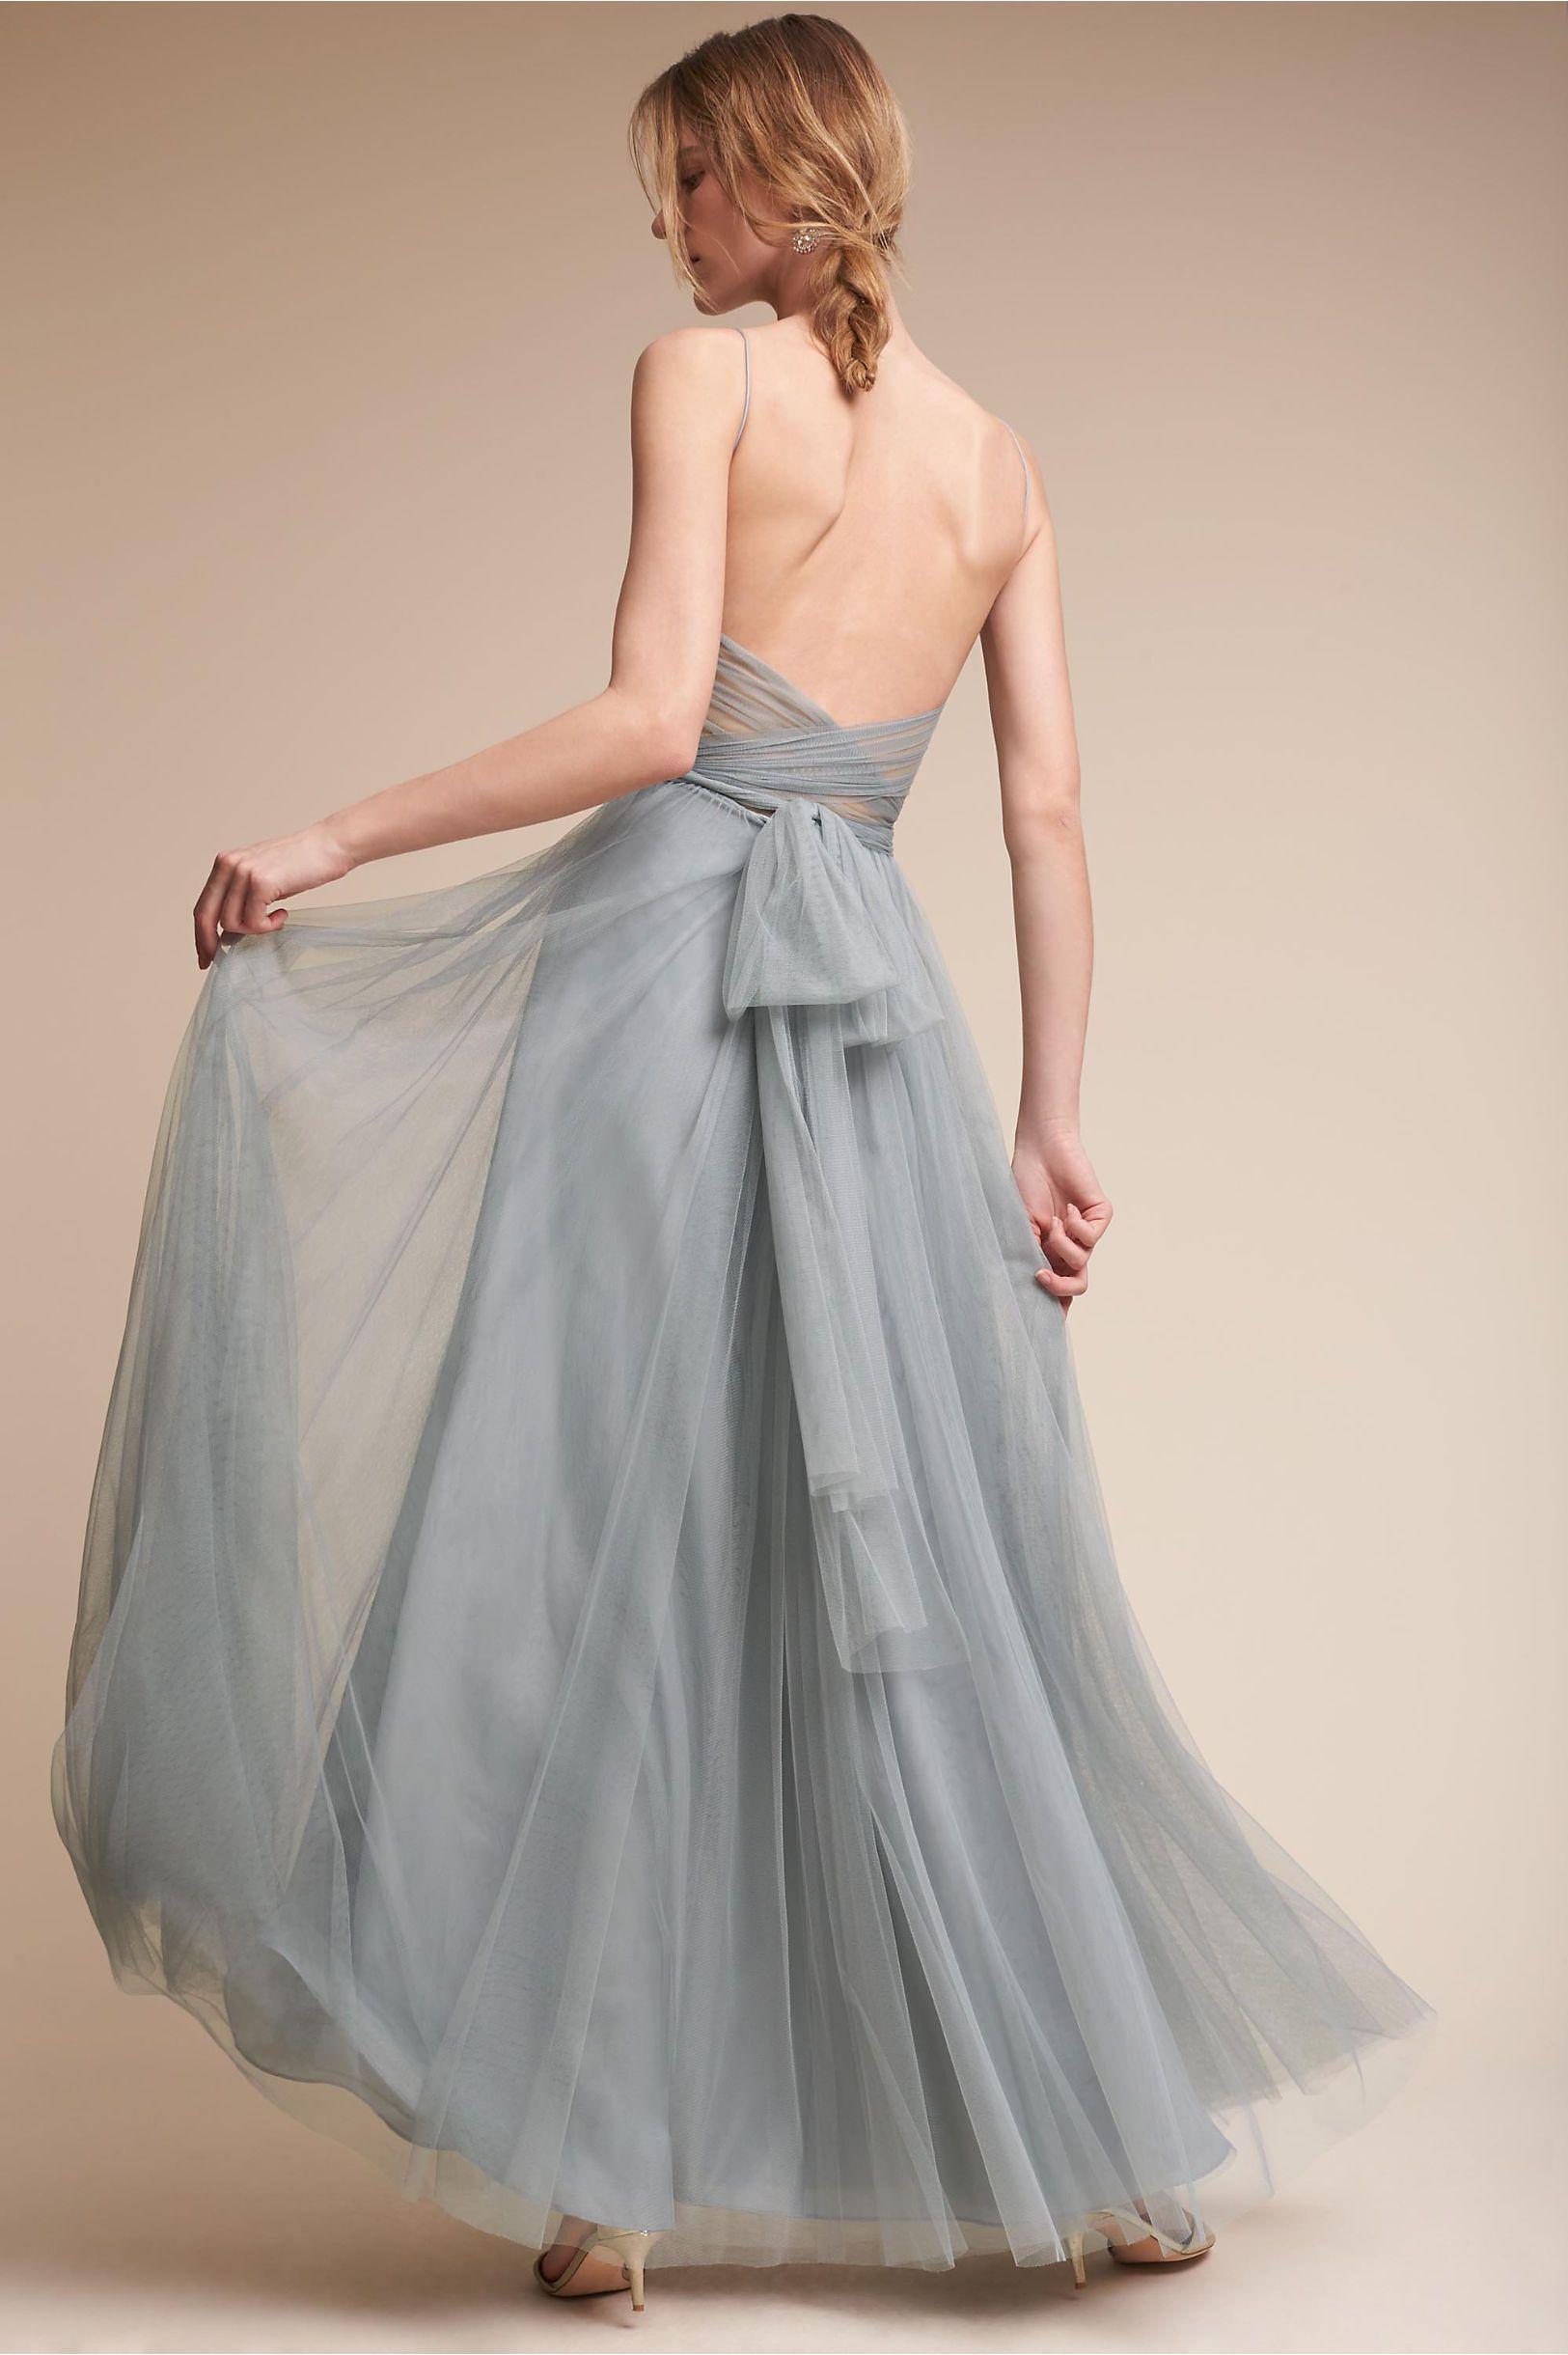 8062fb78f7504 BHLDN Rose Quartz Tinsley Dress in Bride | BHLDN | Wedding | Dresses ...